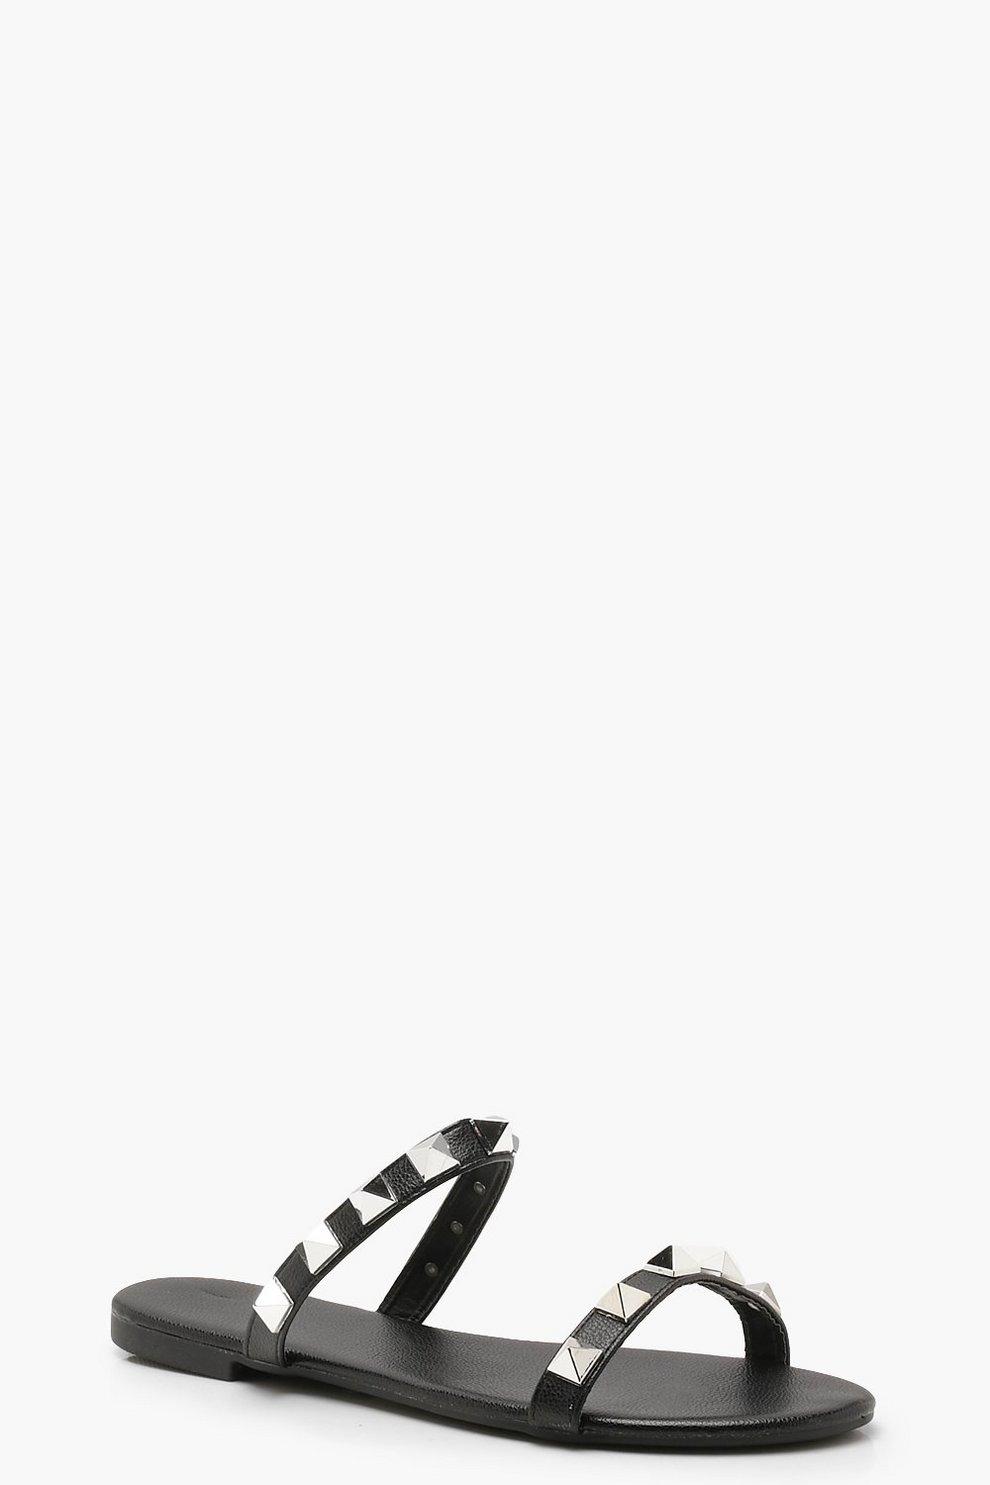 81602935b Studded Double Band Sliders